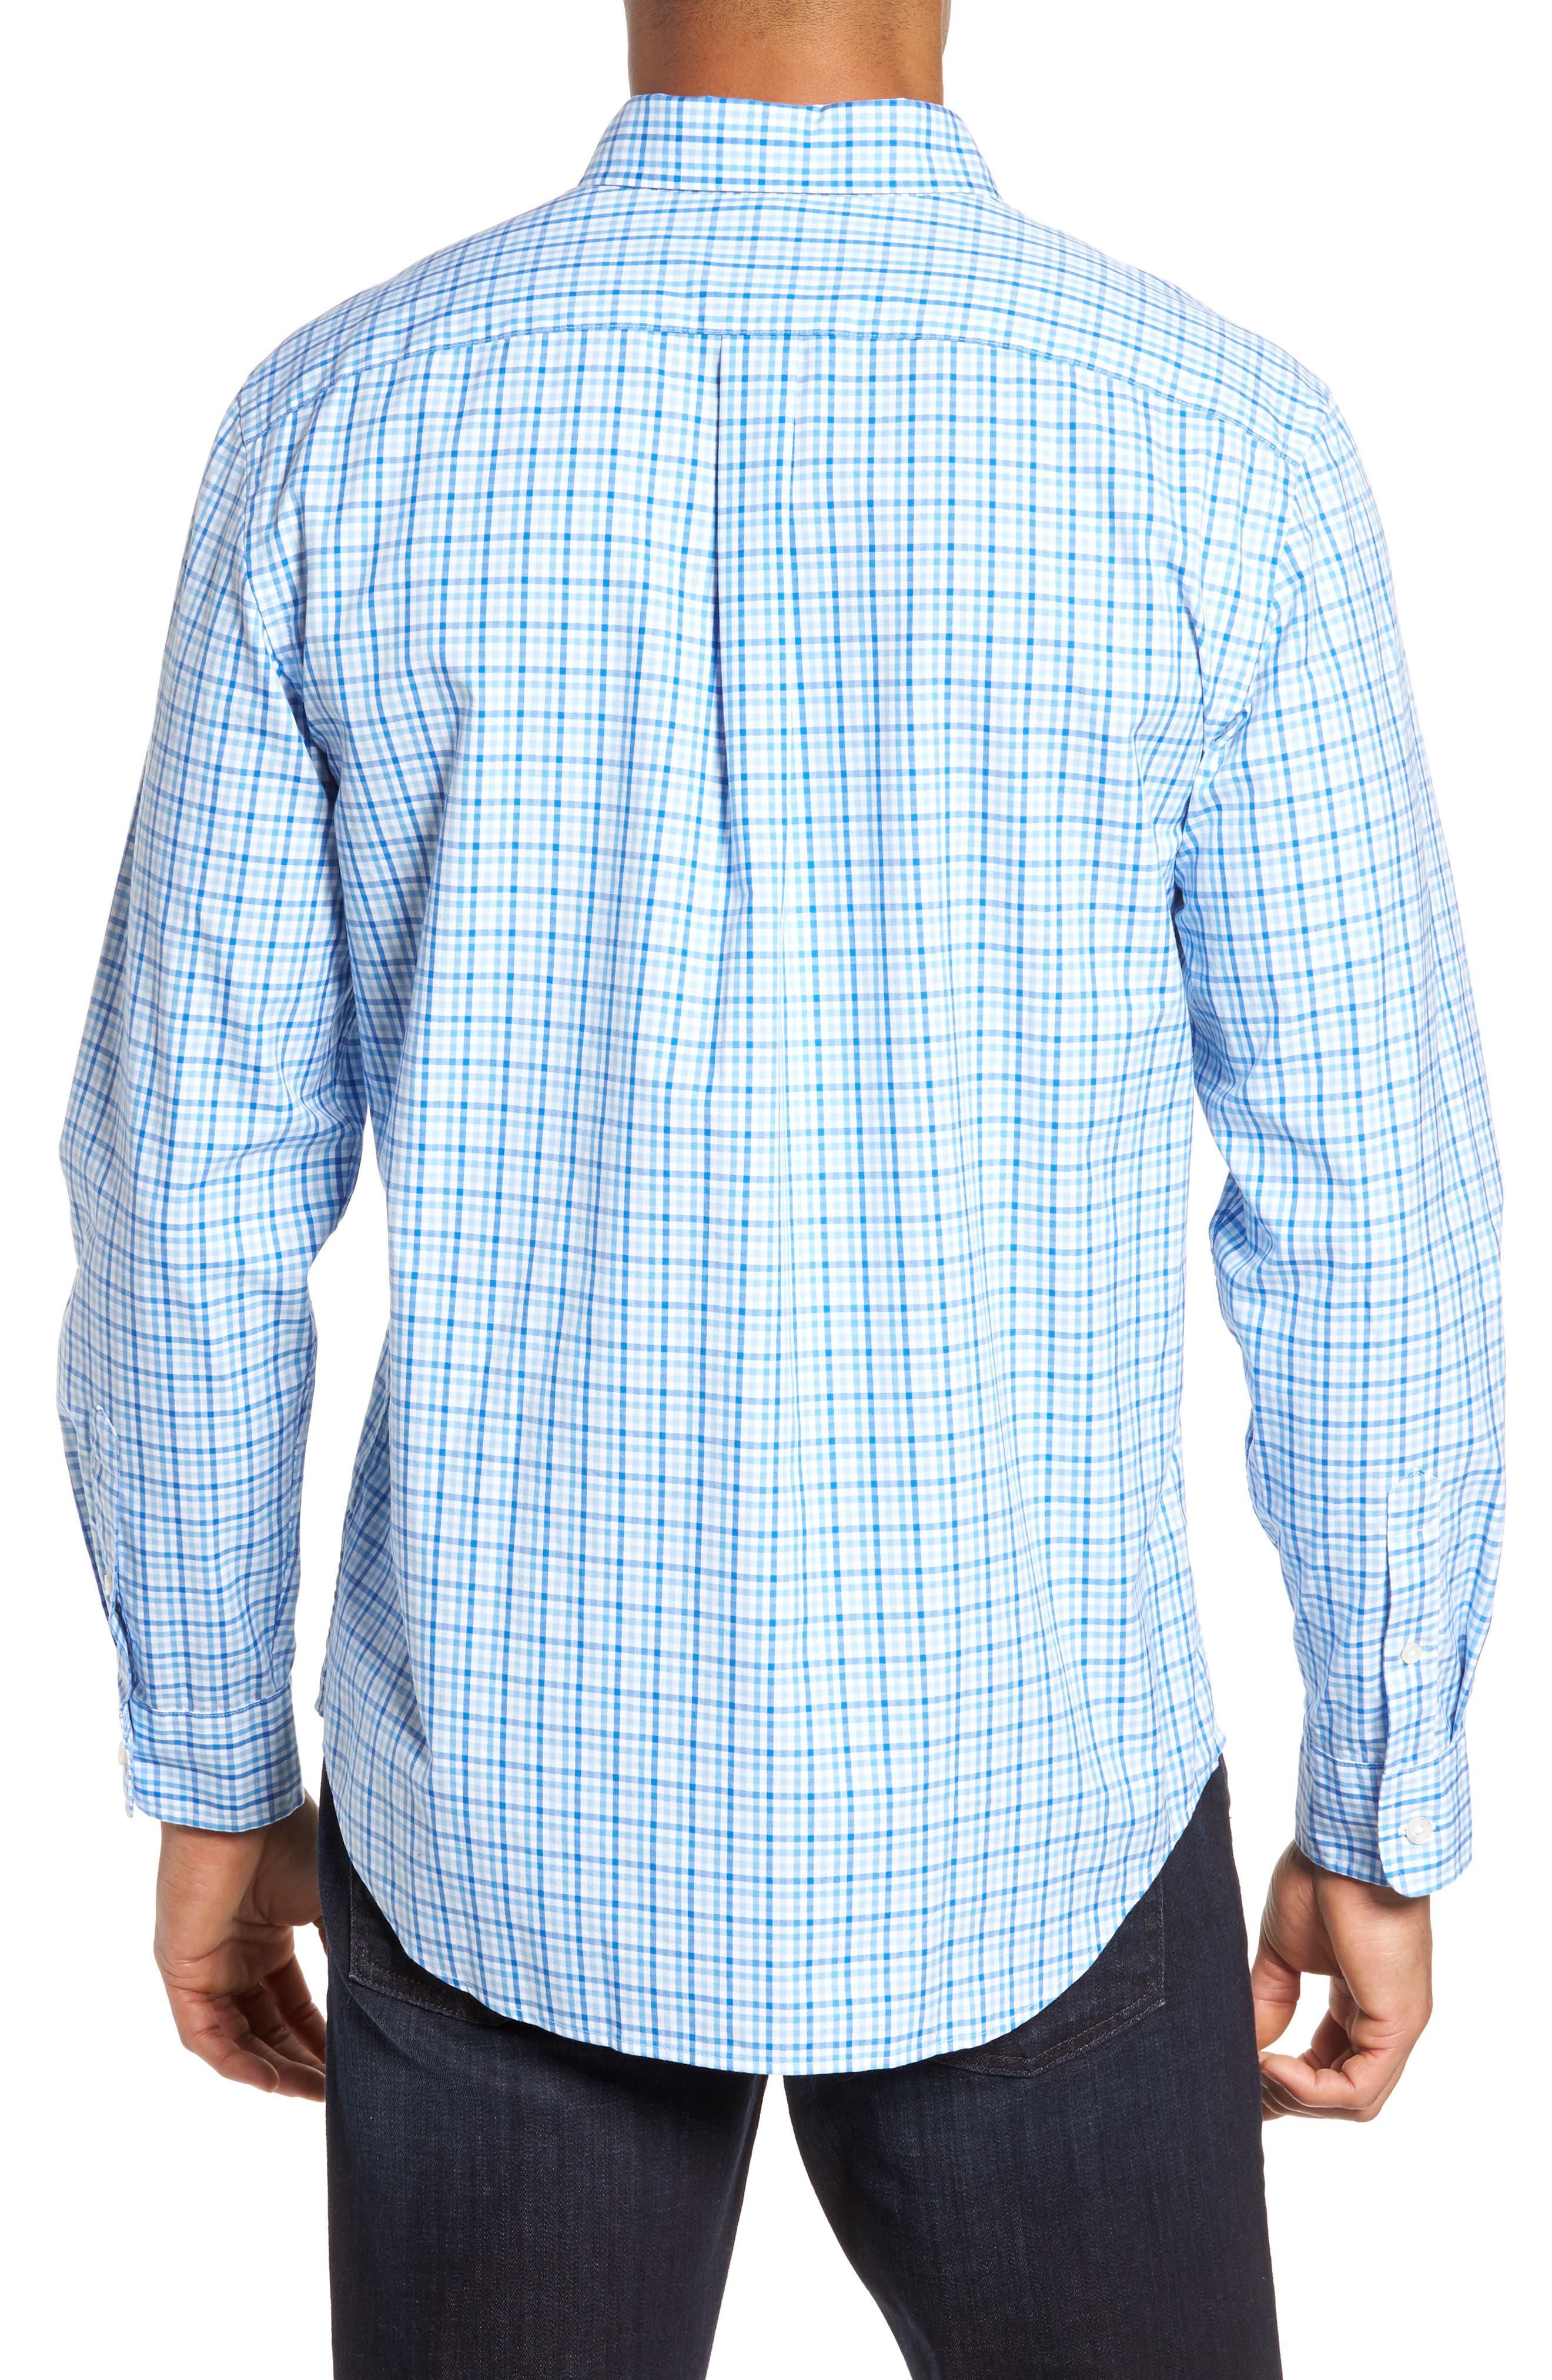 Munroe Tucker Classic Fit Gingham Sport Shirt,                             Alternate thumbnail 2, color,                             456